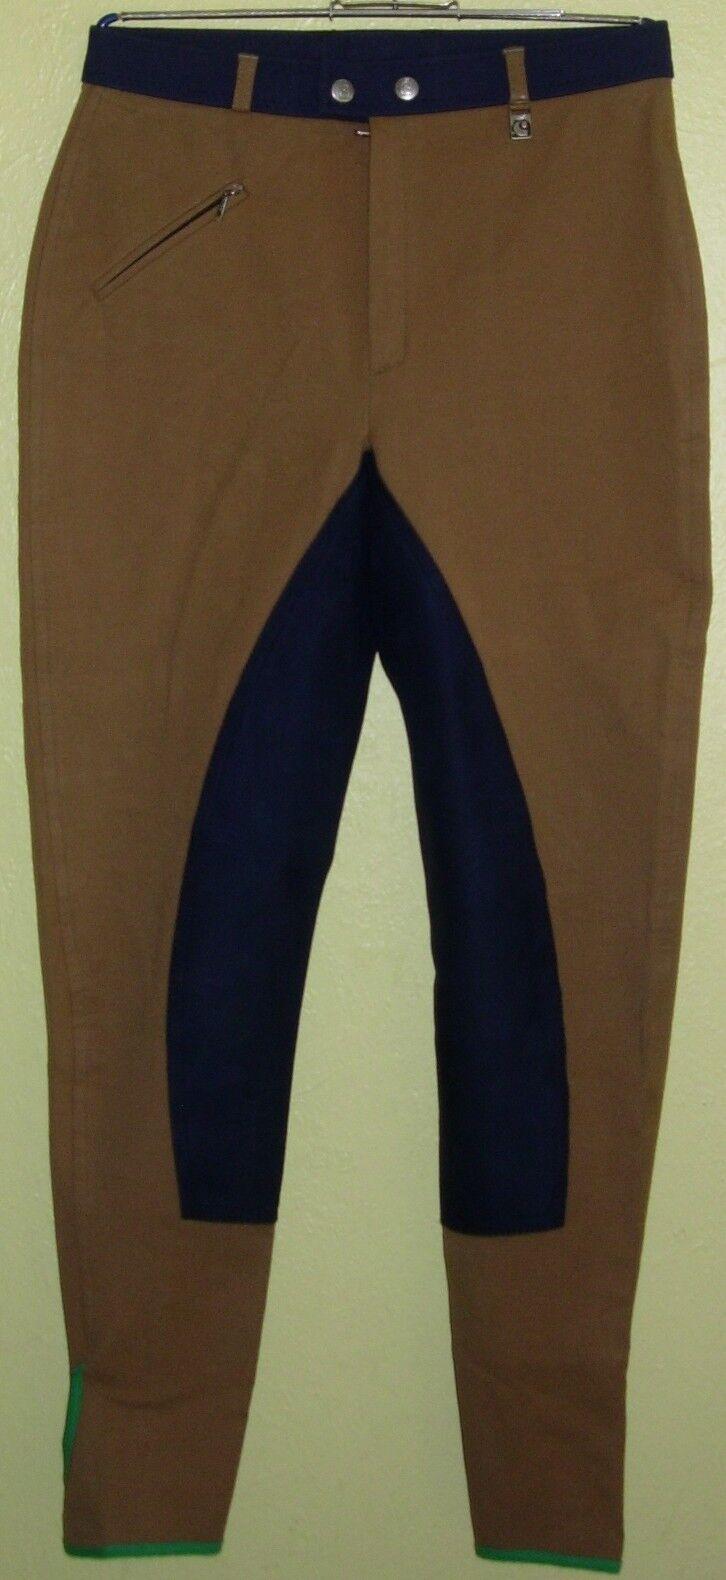 34) Brown  bluee Lady VB Jodhpurs Size 182 the company Cavallo NEW  creative products